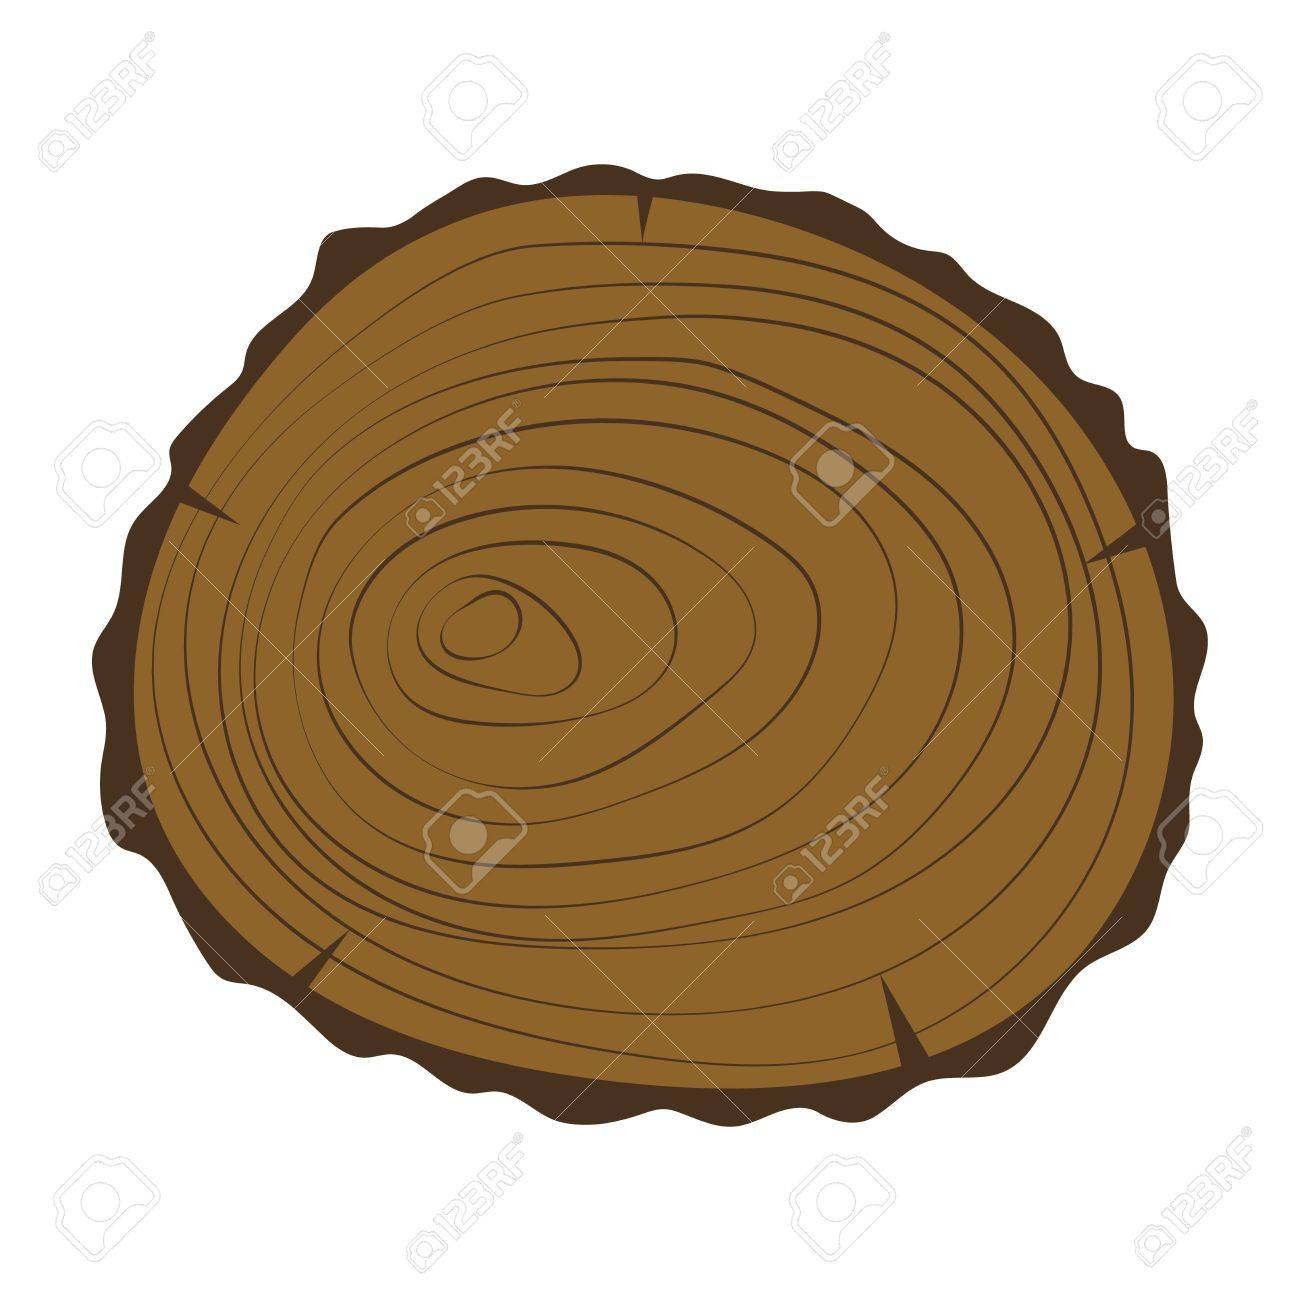 wood slice texture wooden circle cut tree material tree slices rh 123rf com wood texture vector black white wood texture vector free download